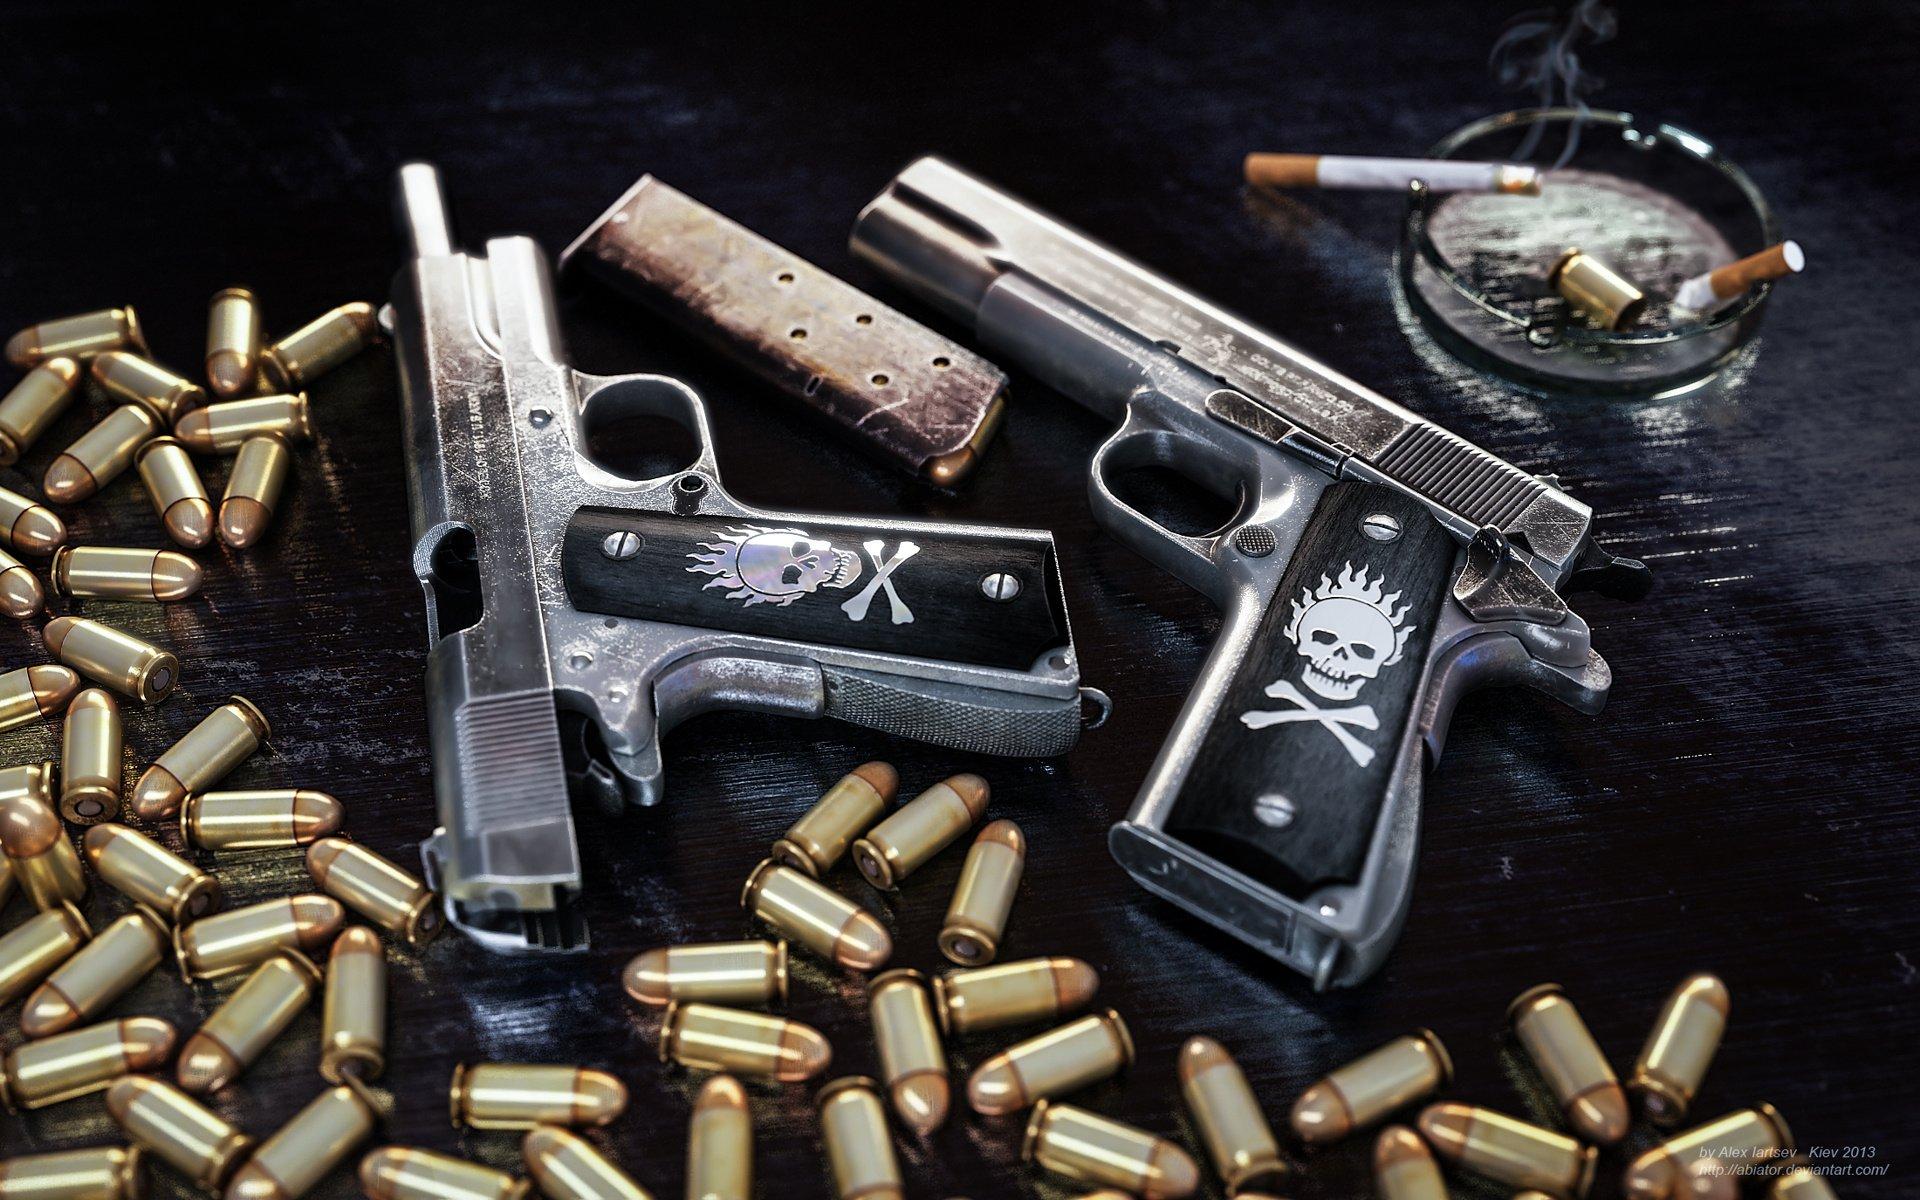 pistol ammunition clip colt ammo weapon gun skull wallpaper background 1920x1200